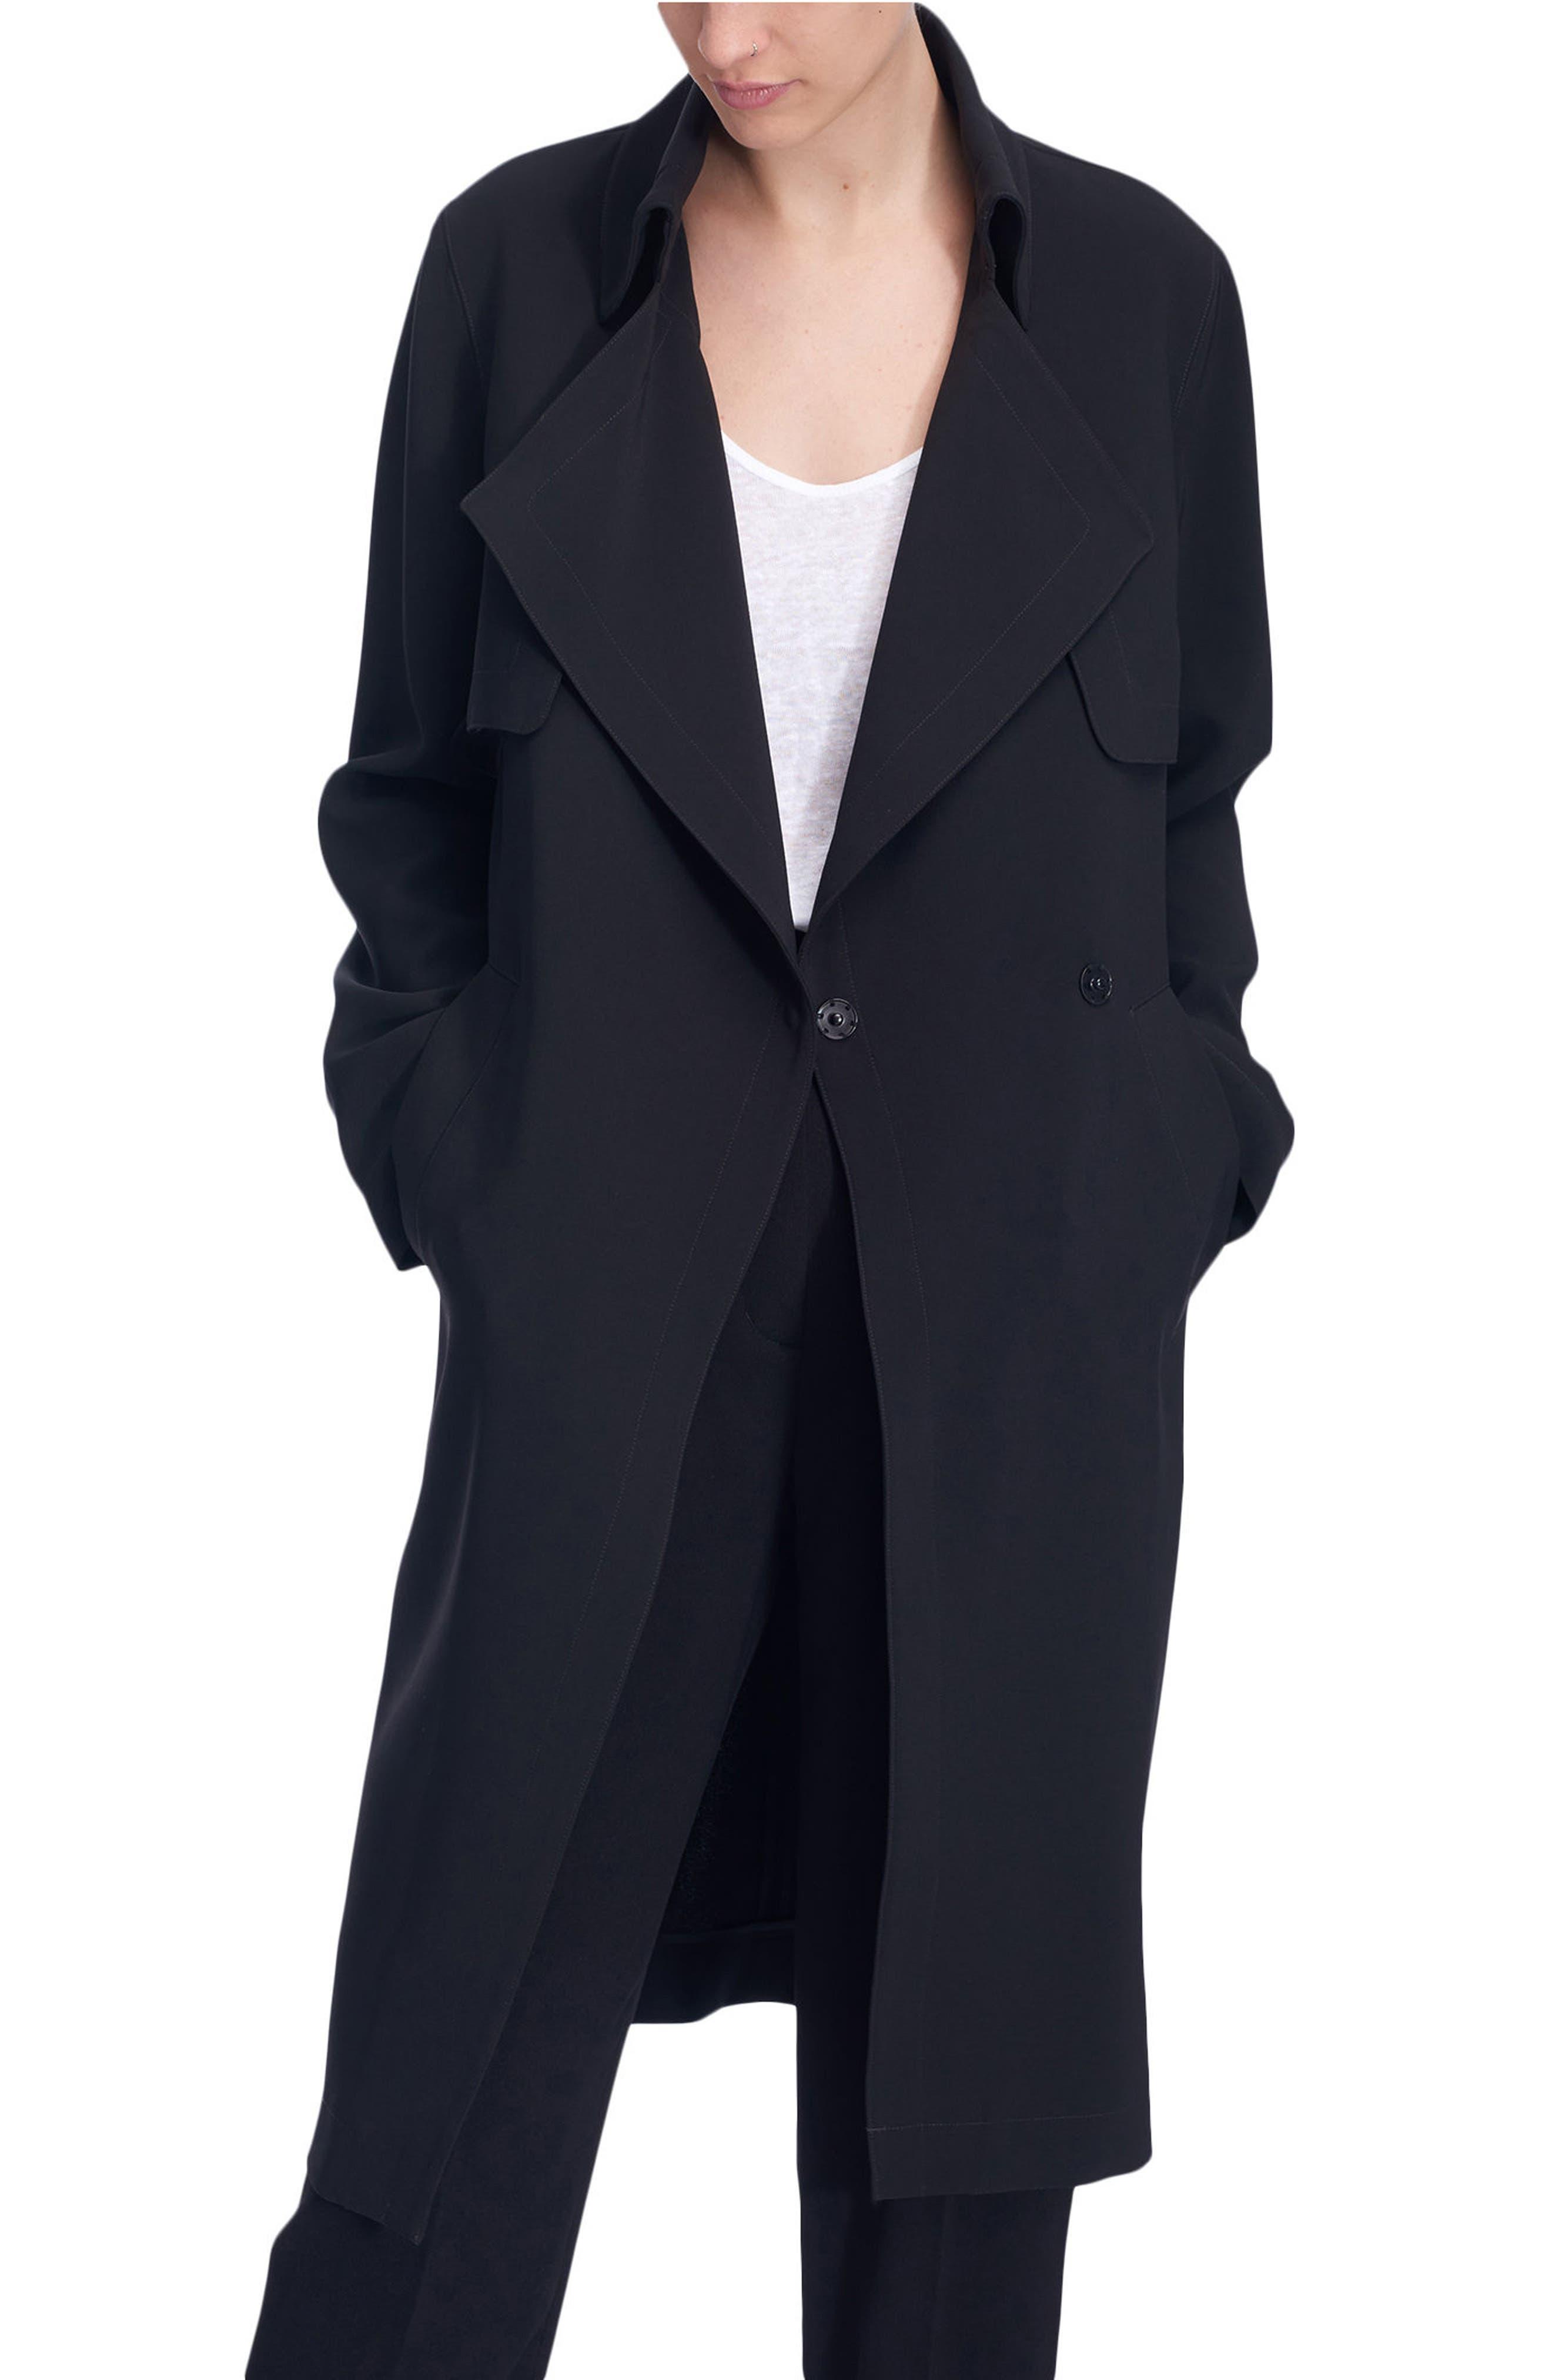 Long Duster Coat,                             Main thumbnail 1, color,                             Black